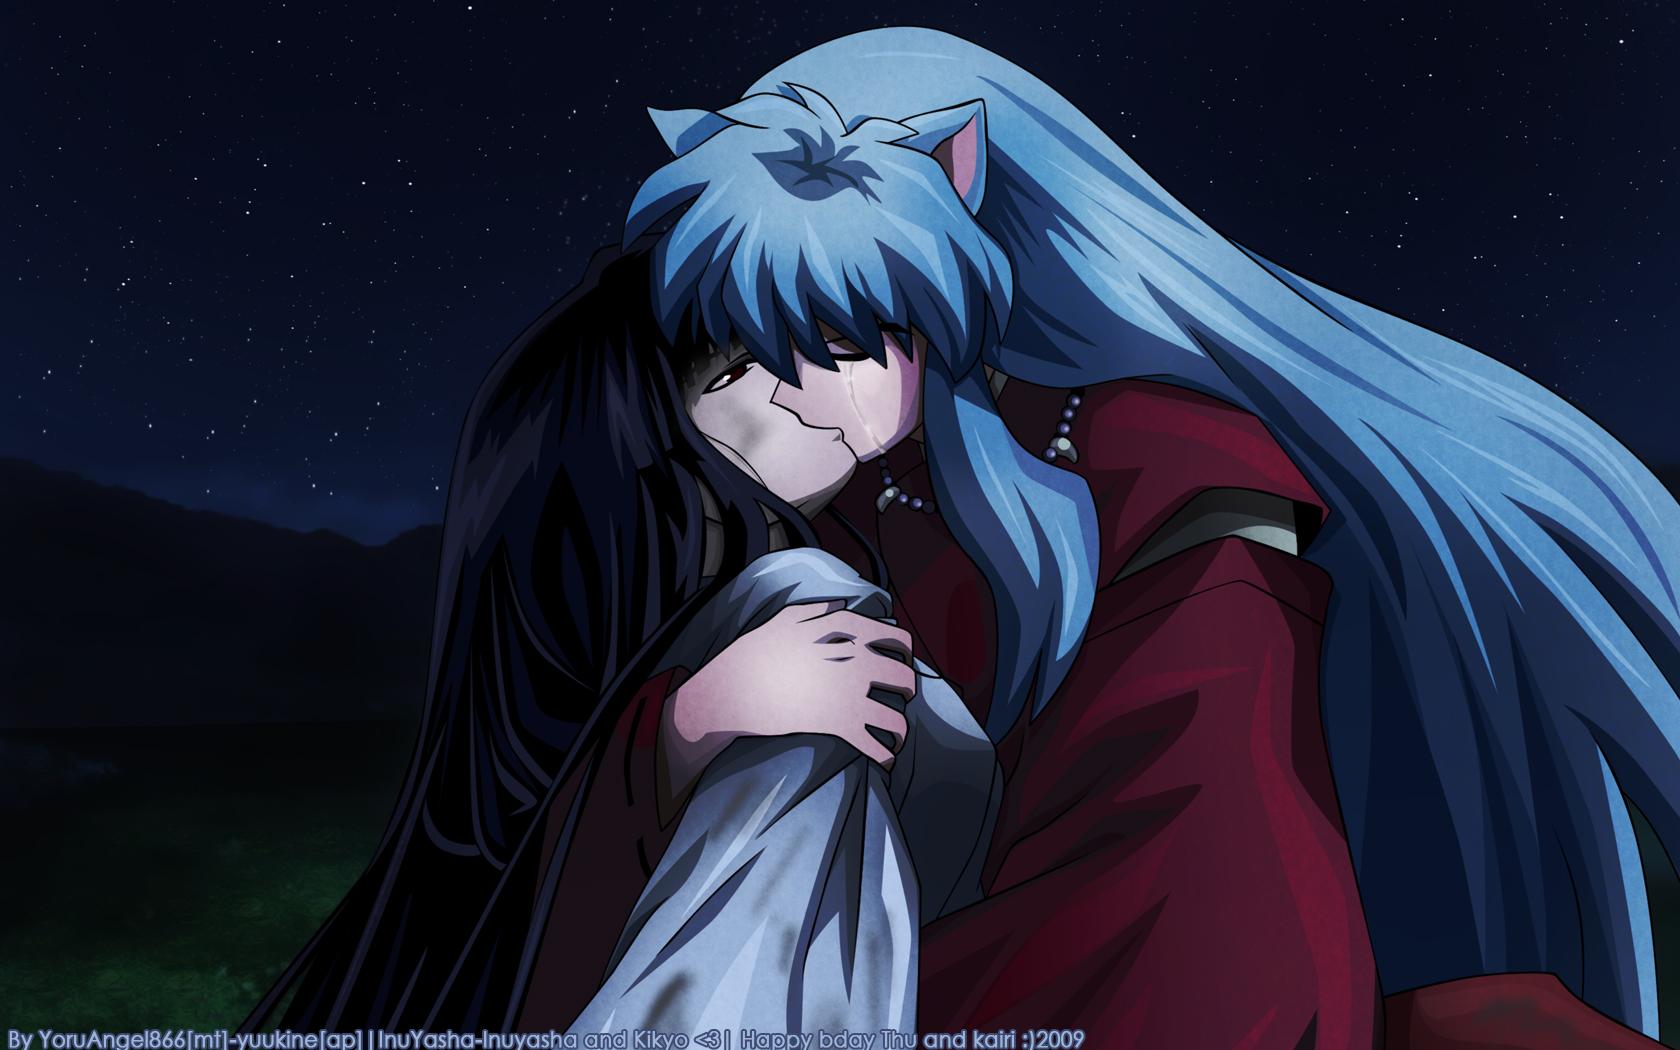 Kikyo (inuyasha), wallpaper zerochan anime image board.